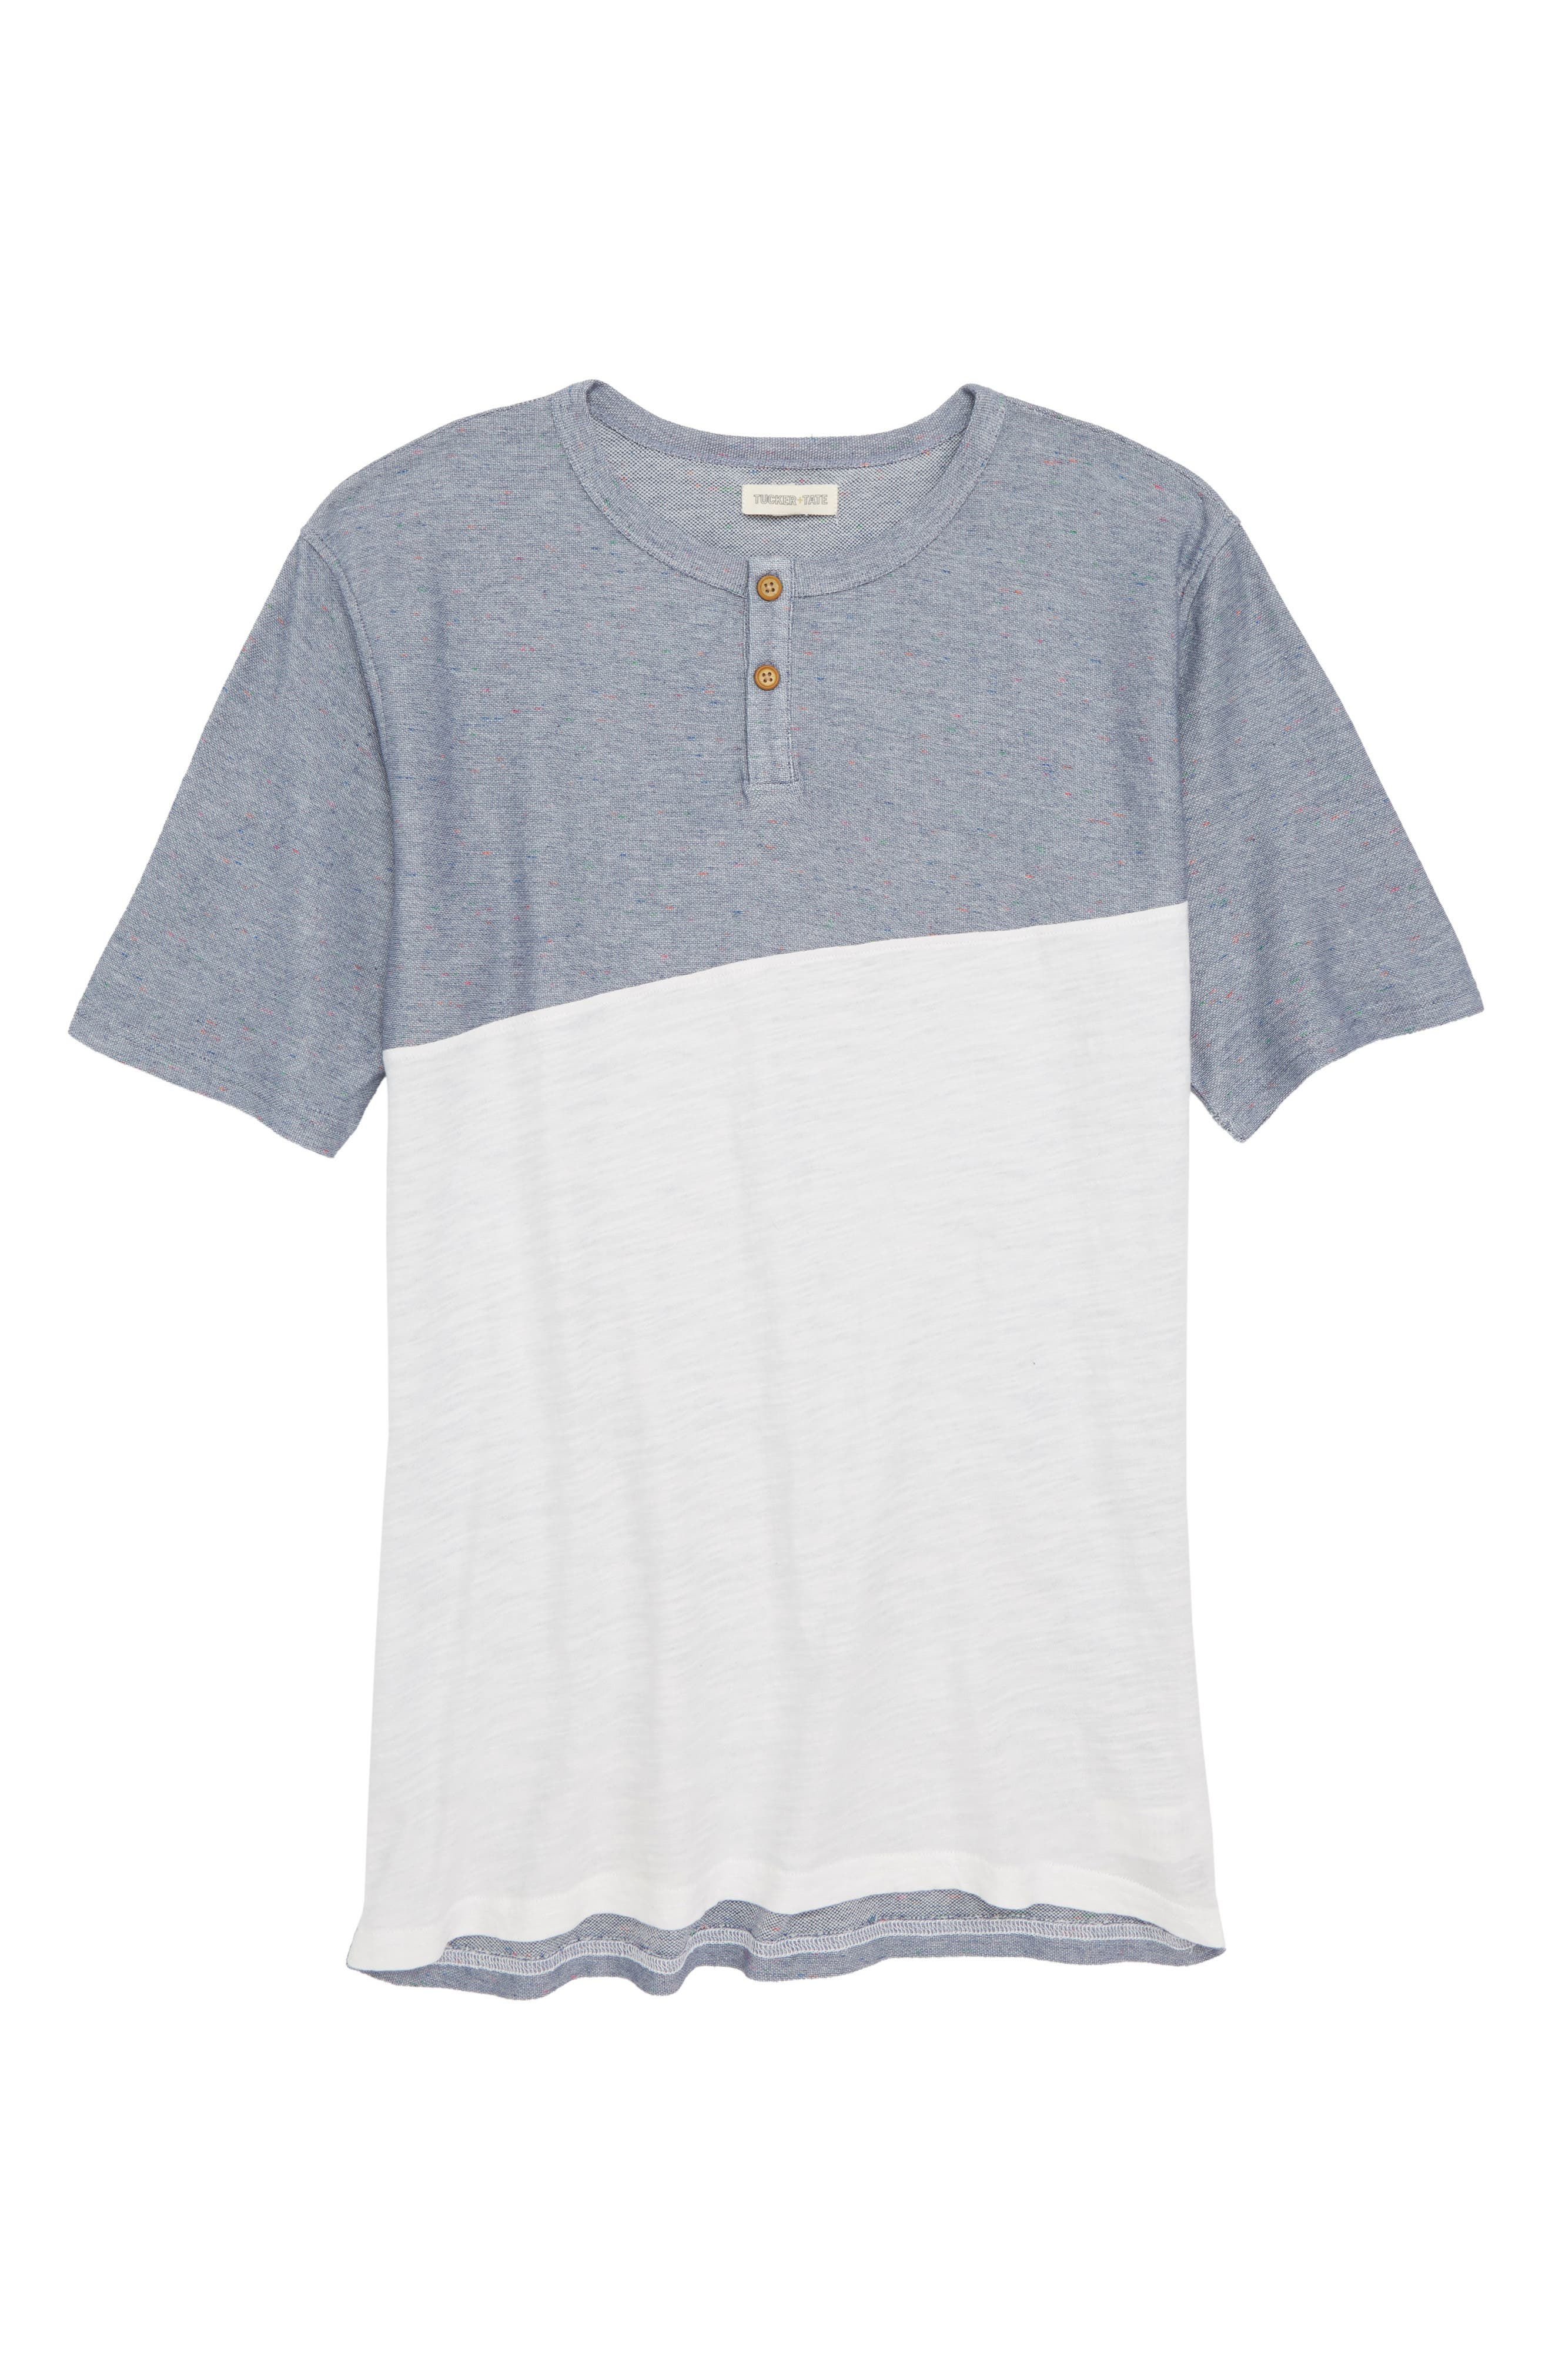 Henley T-Shirt,                             Main thumbnail 1, color,                             050